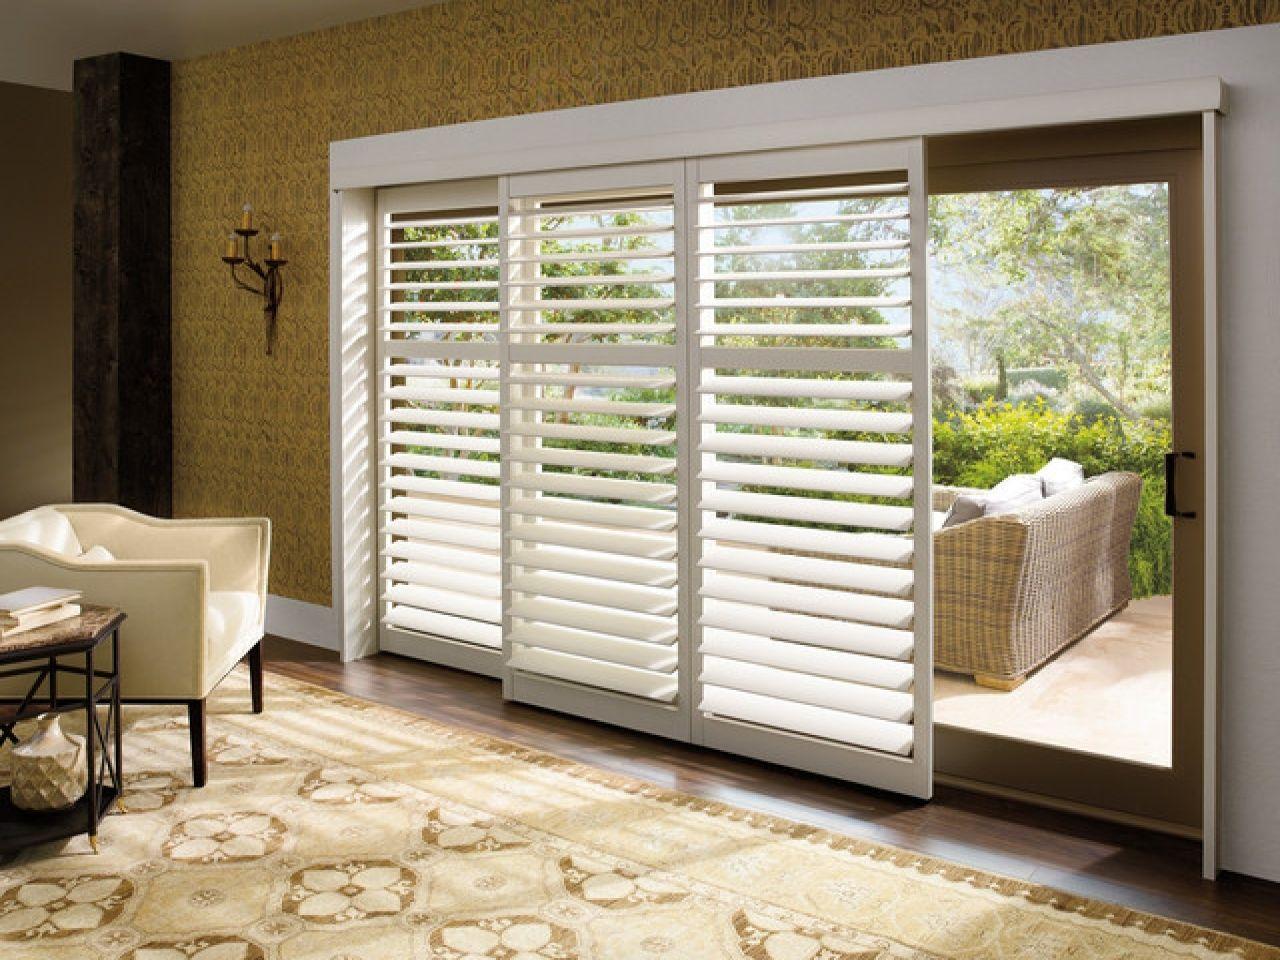 Window Covers For Sliding Glass Doors Window Pinterest Glass